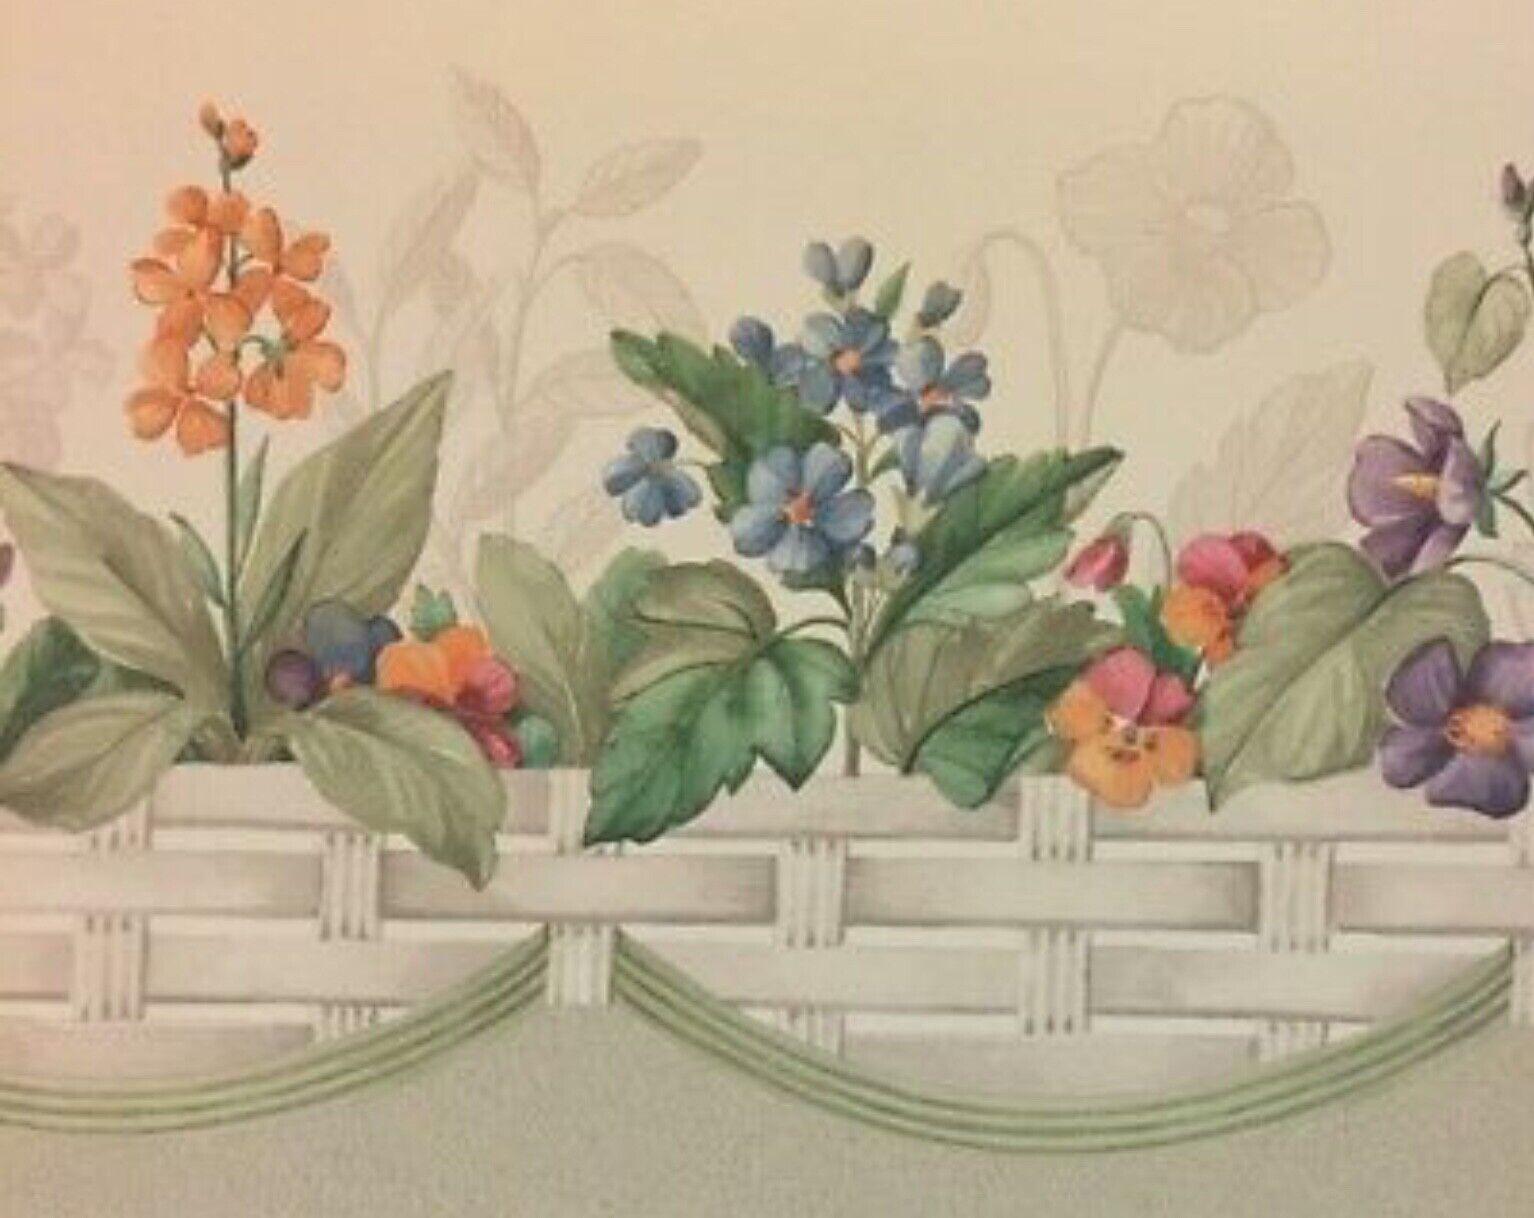 Longaberger Wallpaper Border Botanical Fields 5 Rolls Scalloped